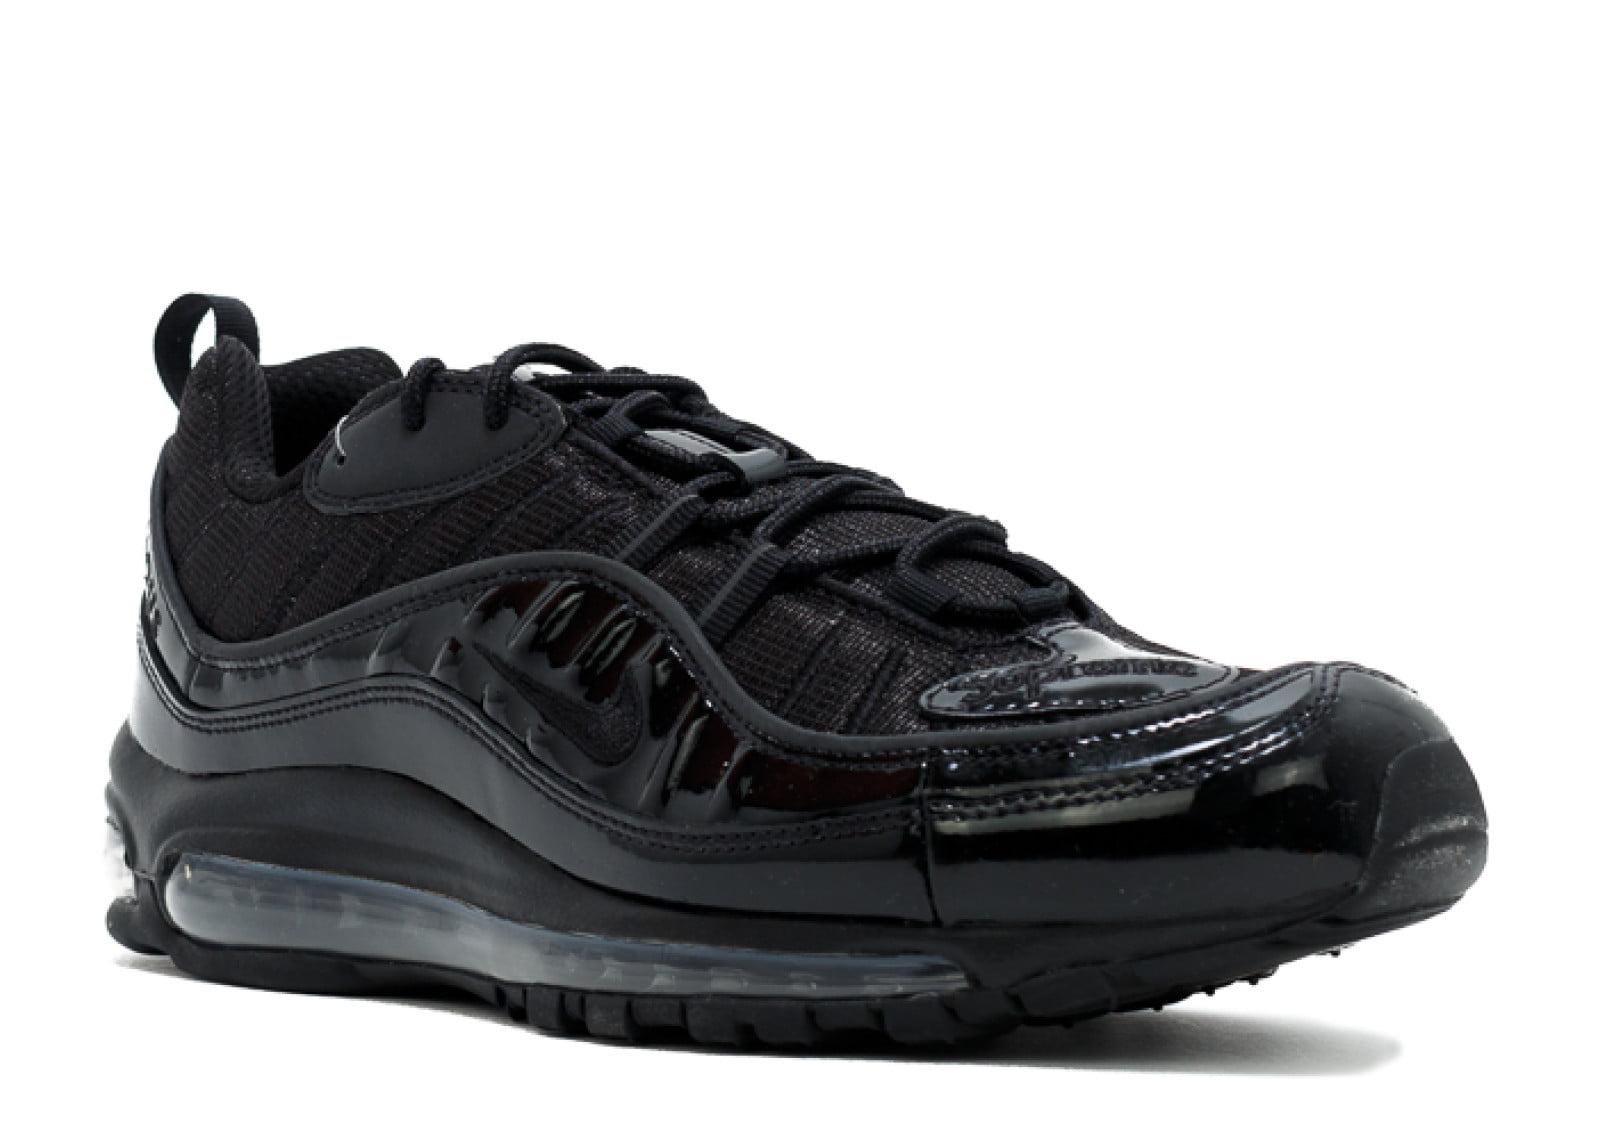 Nike - Men - Nike Air Max 98   Supreme  Supreme  Black -844694-001 - Size  11.5 959e2174d8